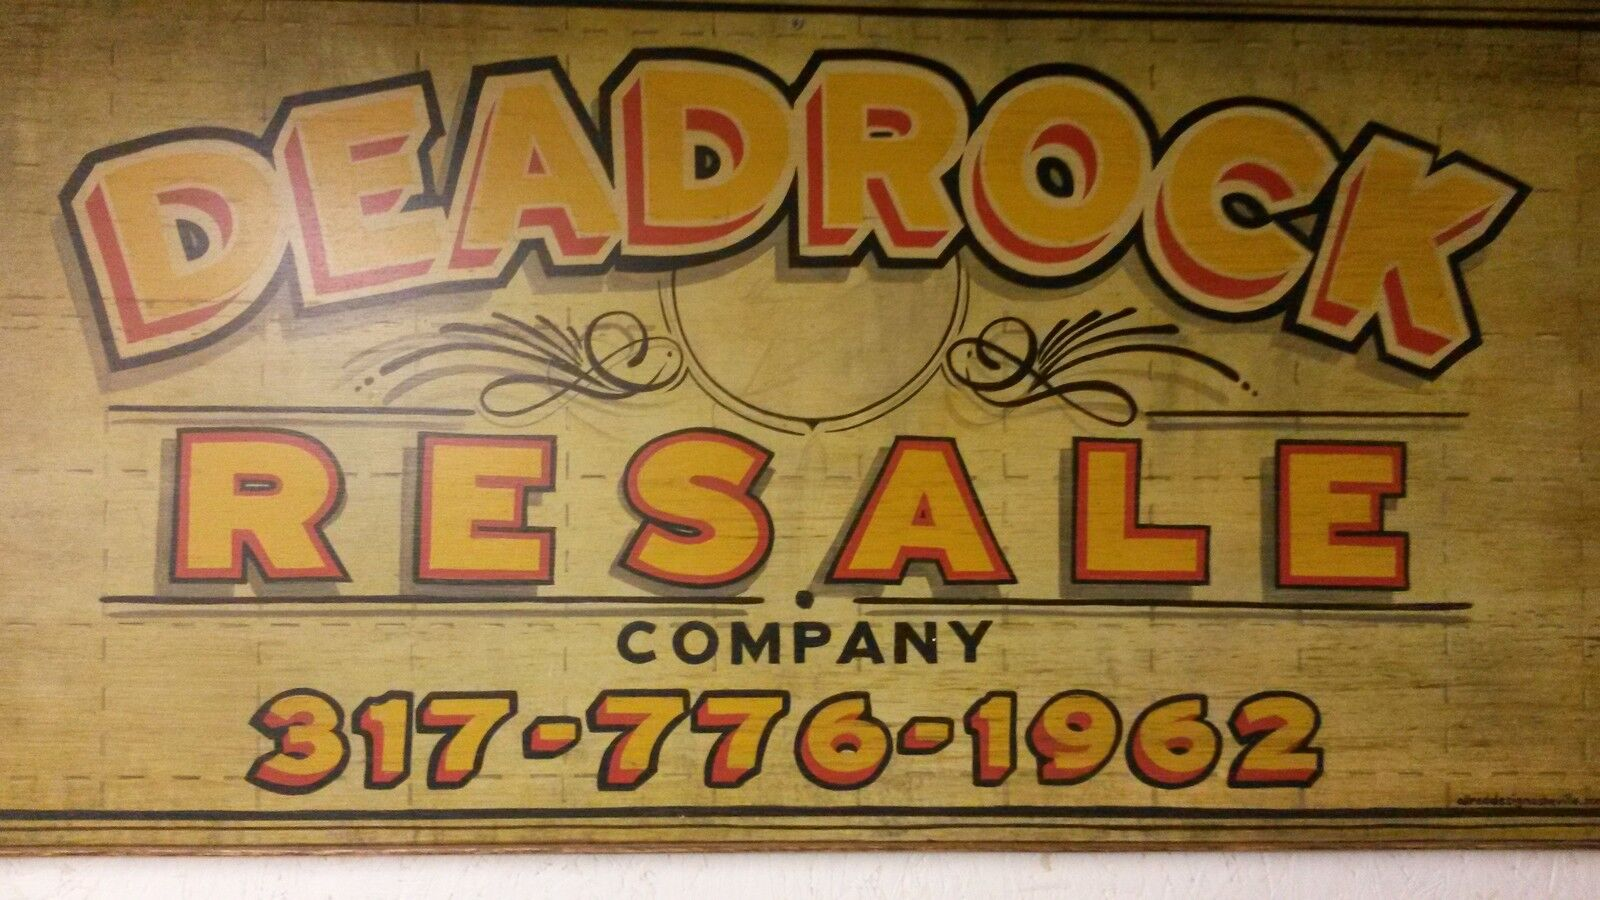 Dead Rock Cafe Resale